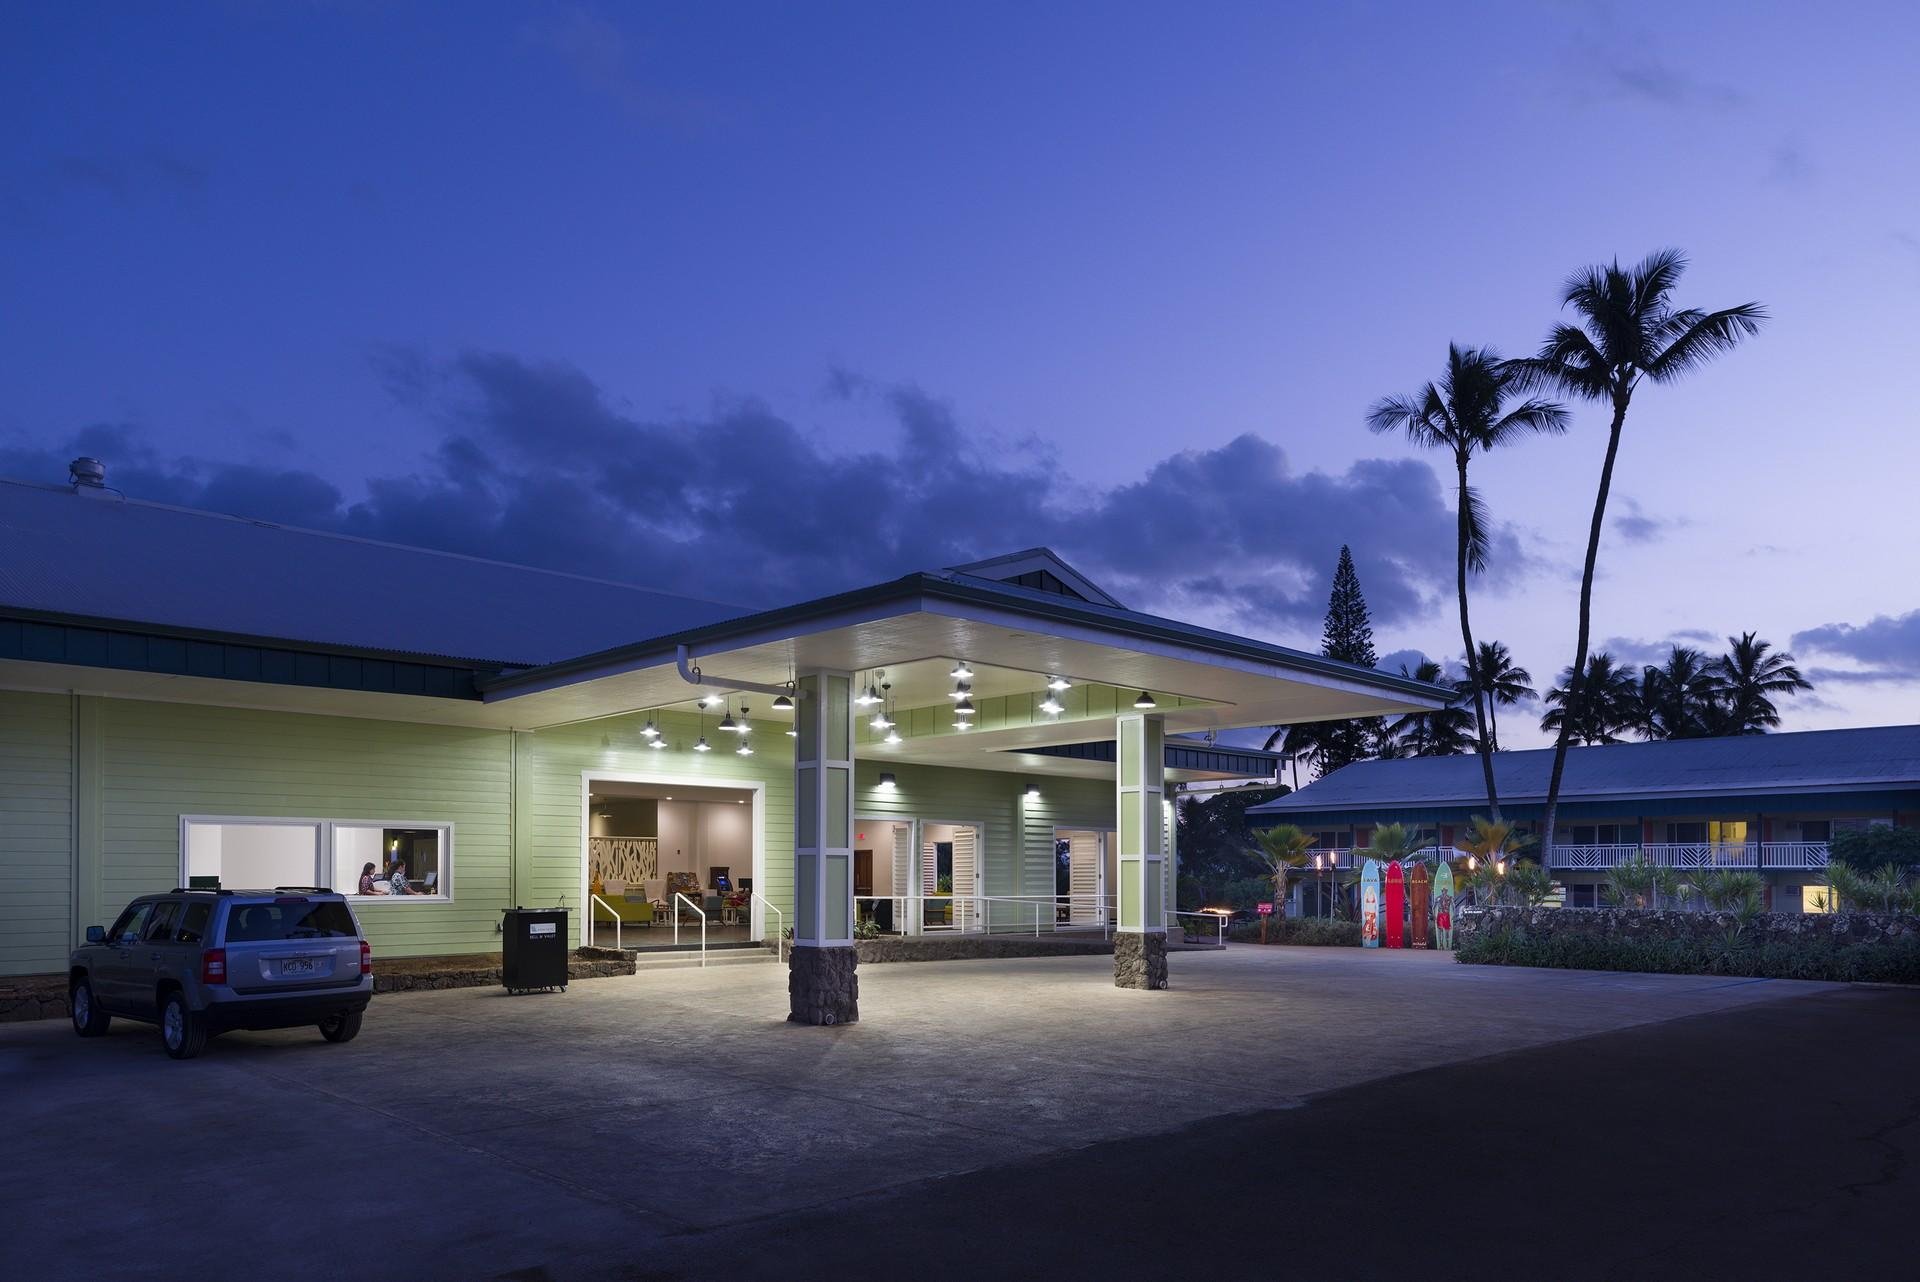 Kauai Shores Hotel image 0